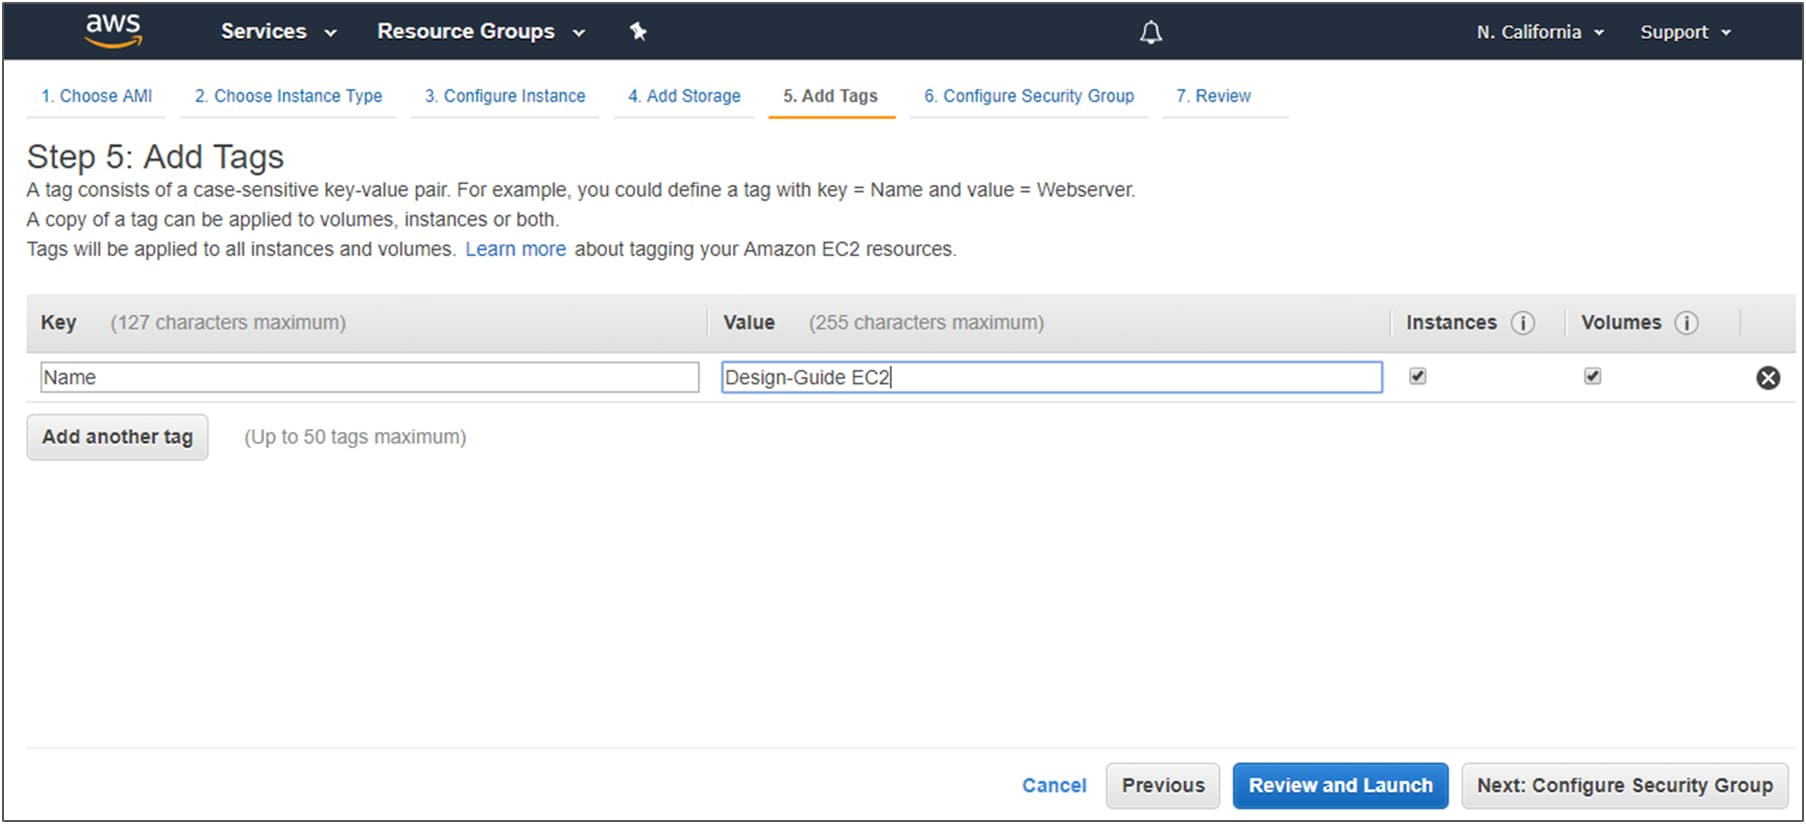 Cisco Multicloud Portfolio: Deployment Guide for Private